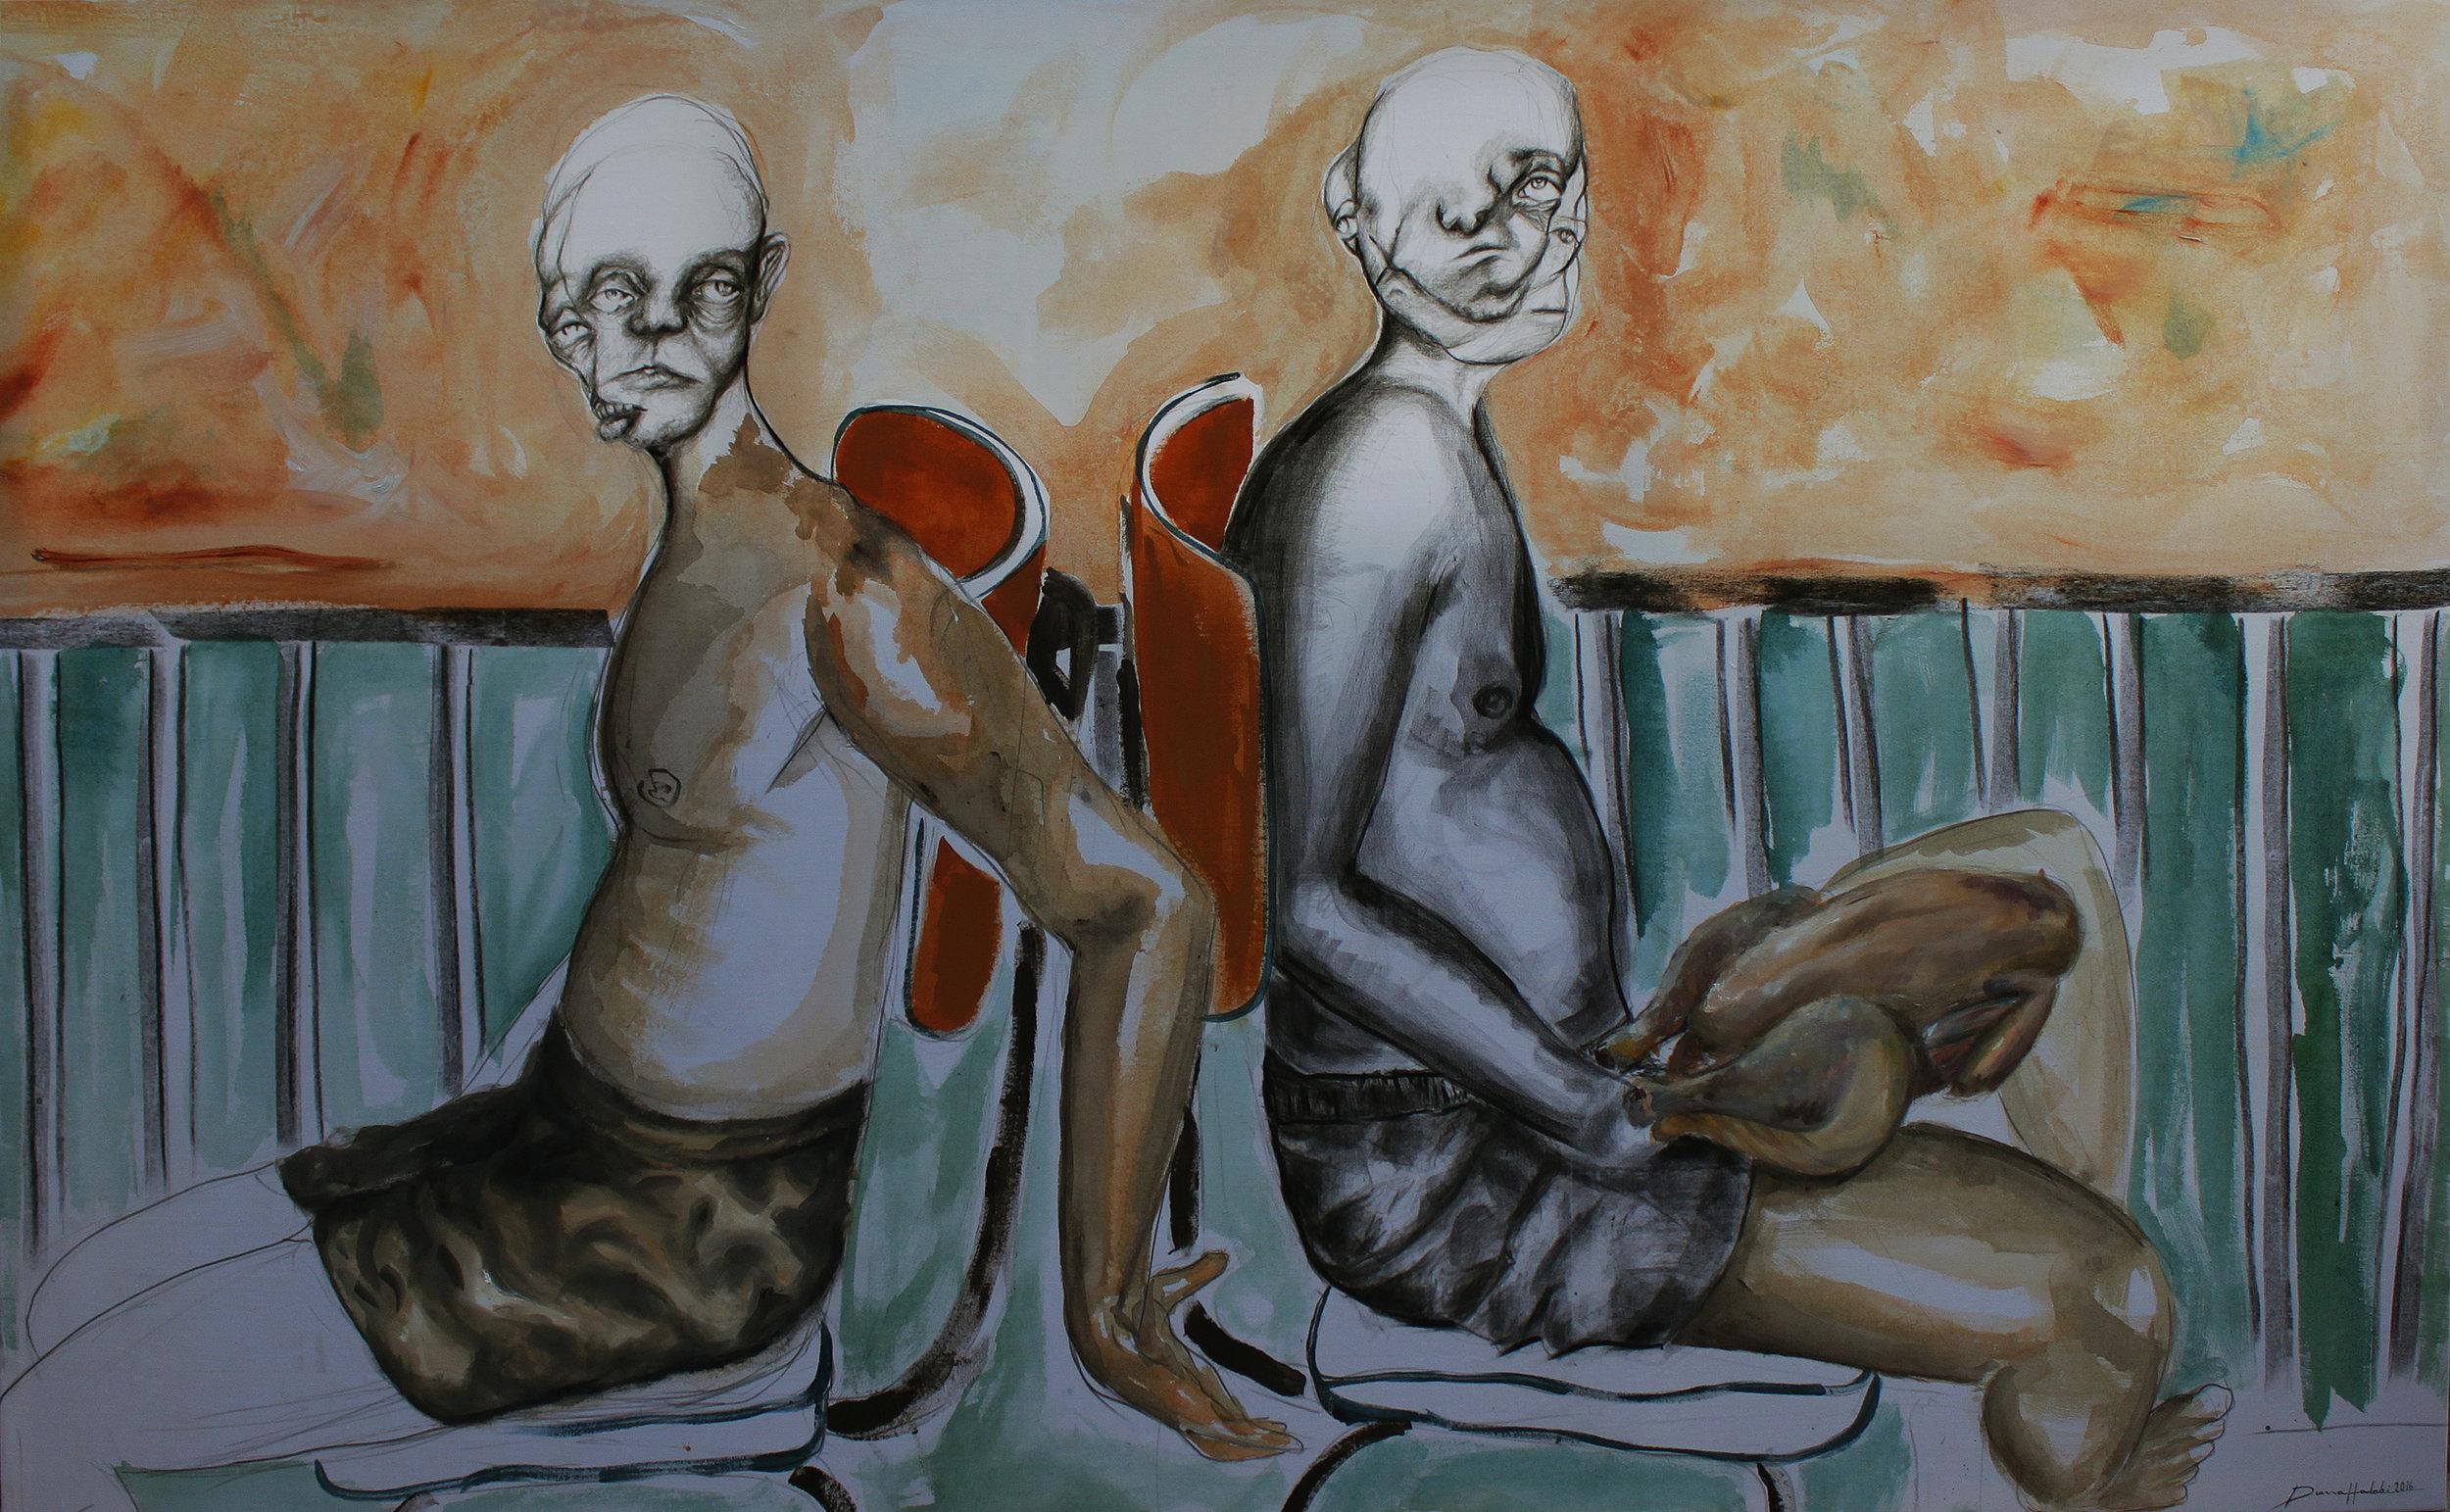 Back to back. Diana Halabi, Acrylic and charcoal on canvas